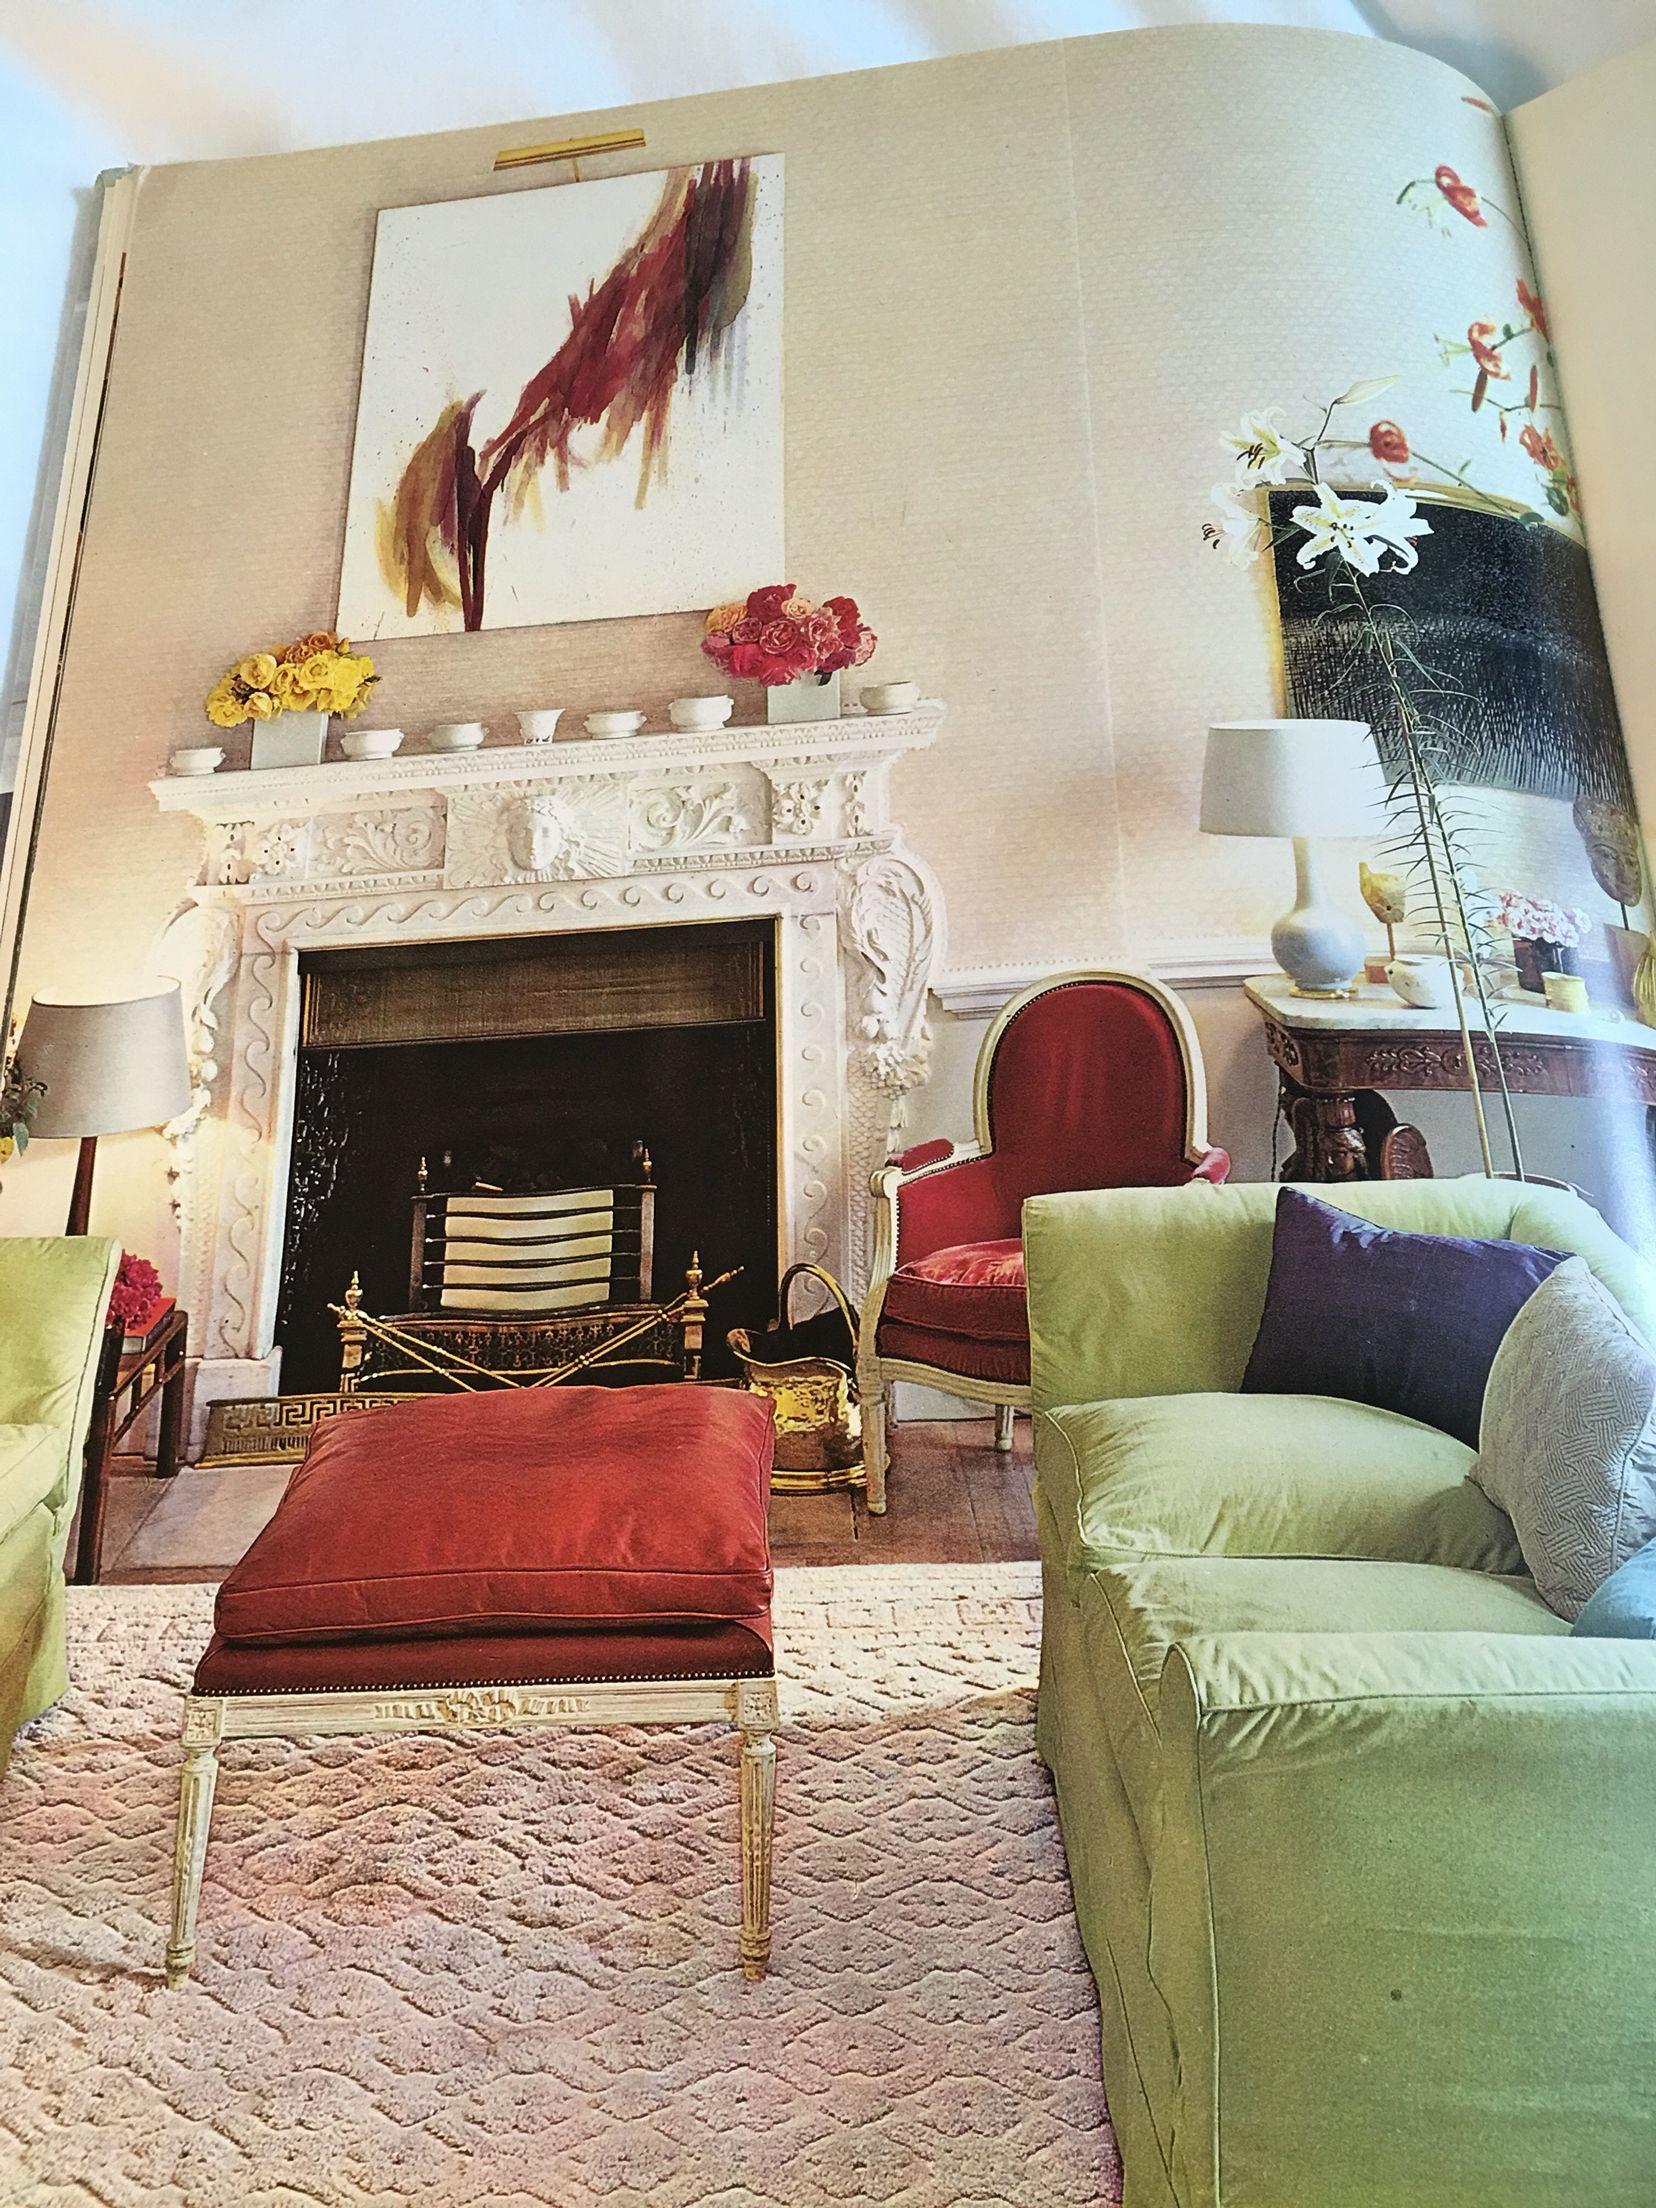 Pin by Ann Andrews on David Hicks   Home decor, Decor ...